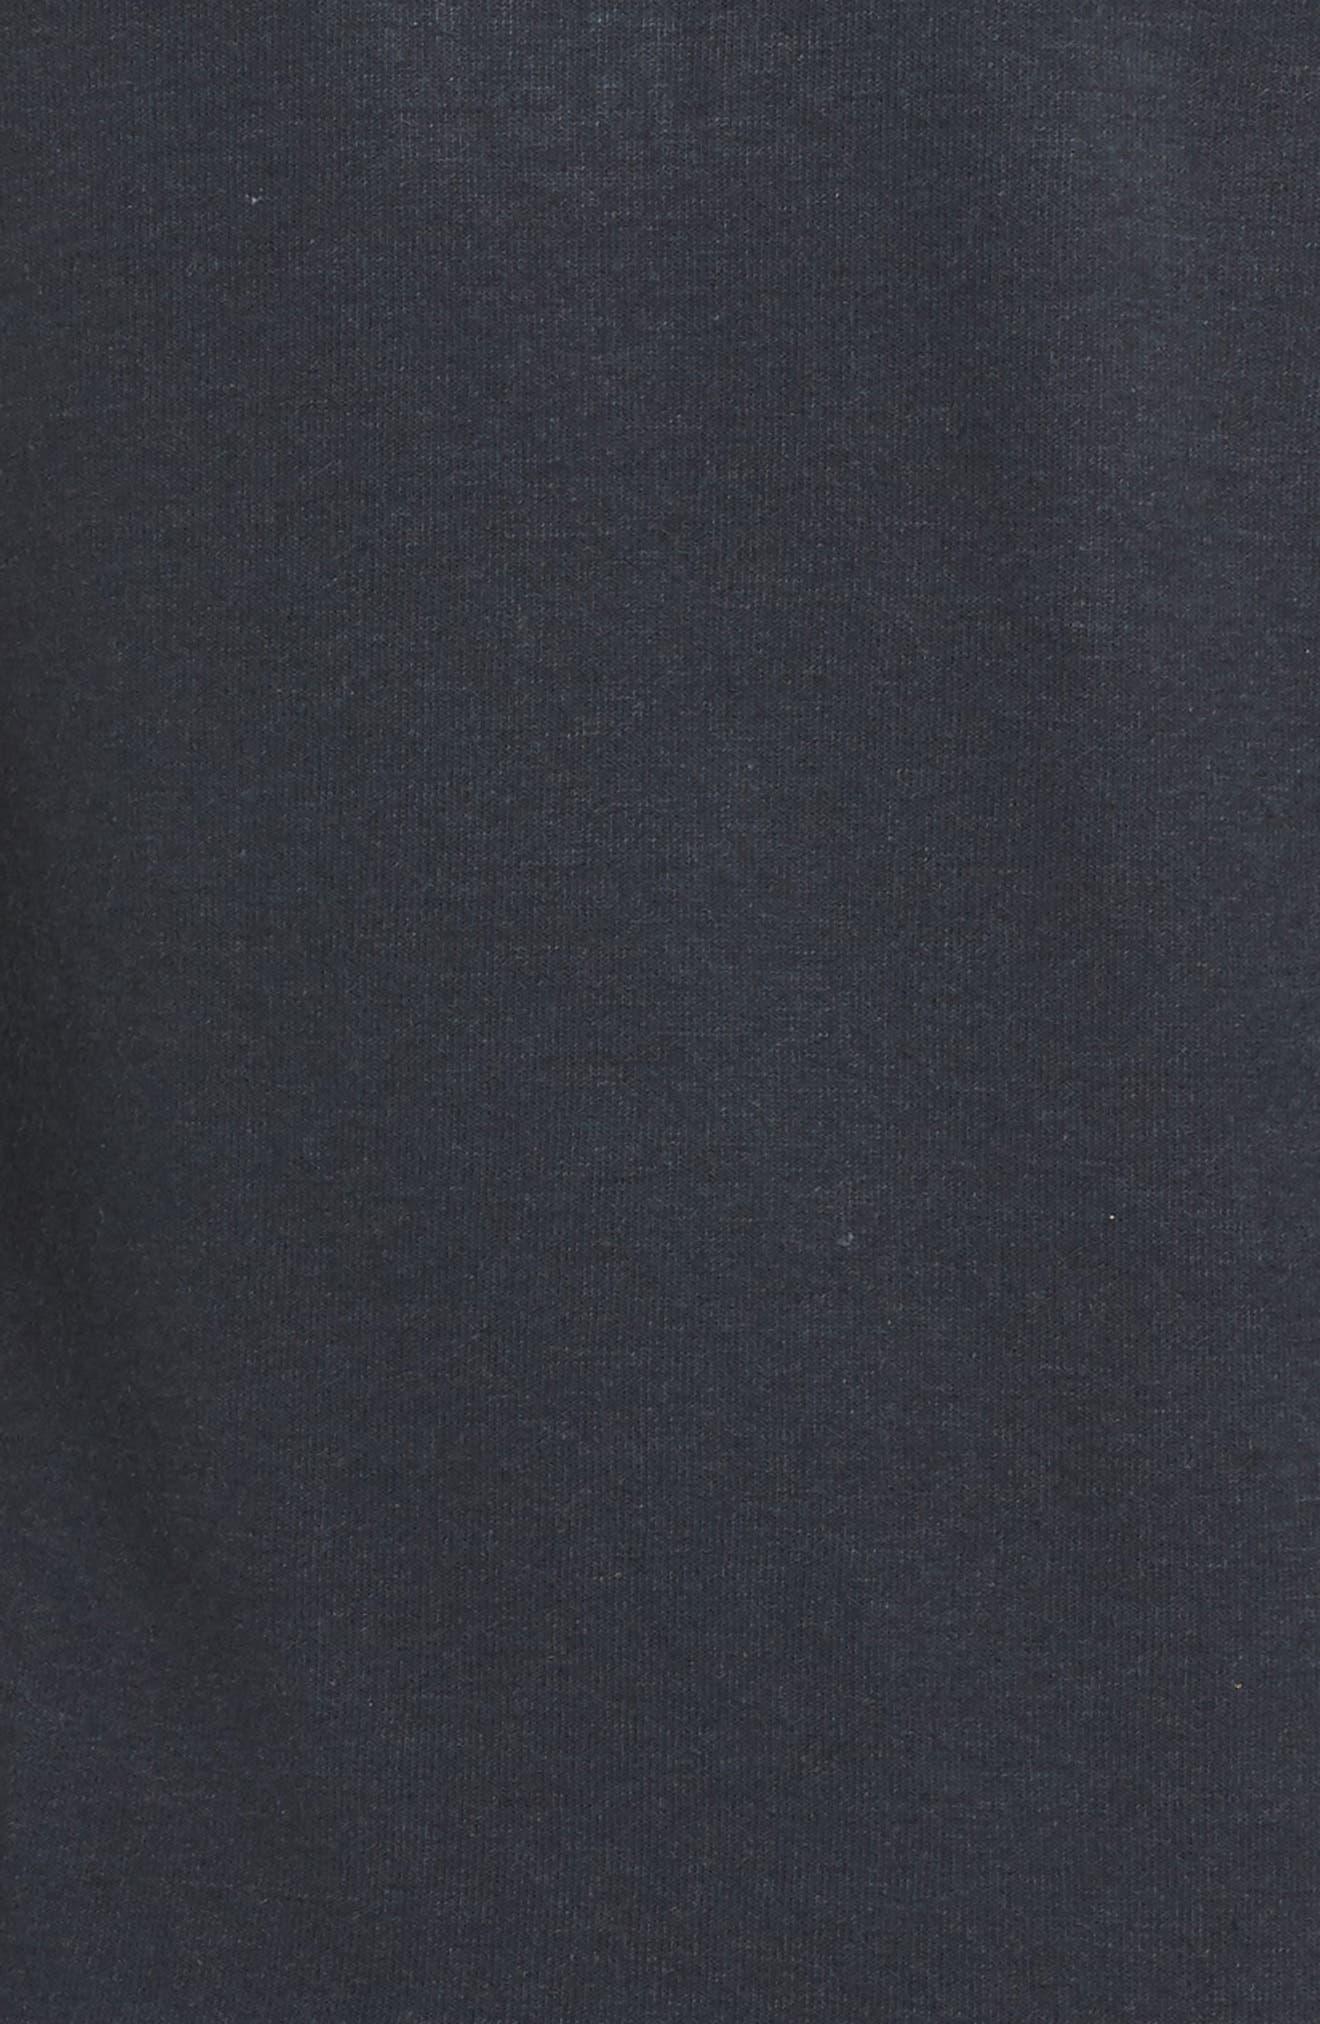 Zip Hoodie,                             Alternate thumbnail 5, color,                             Charcoal